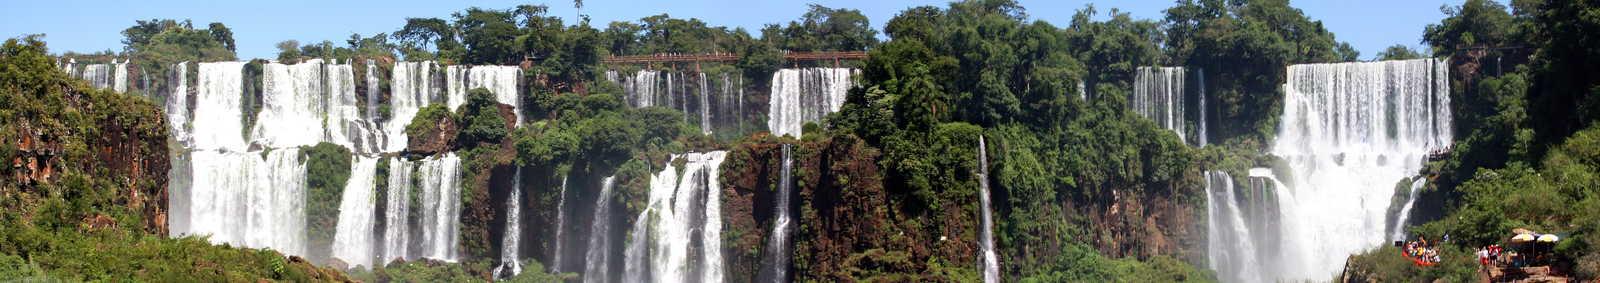 Iguassu Waterfal, Brazil